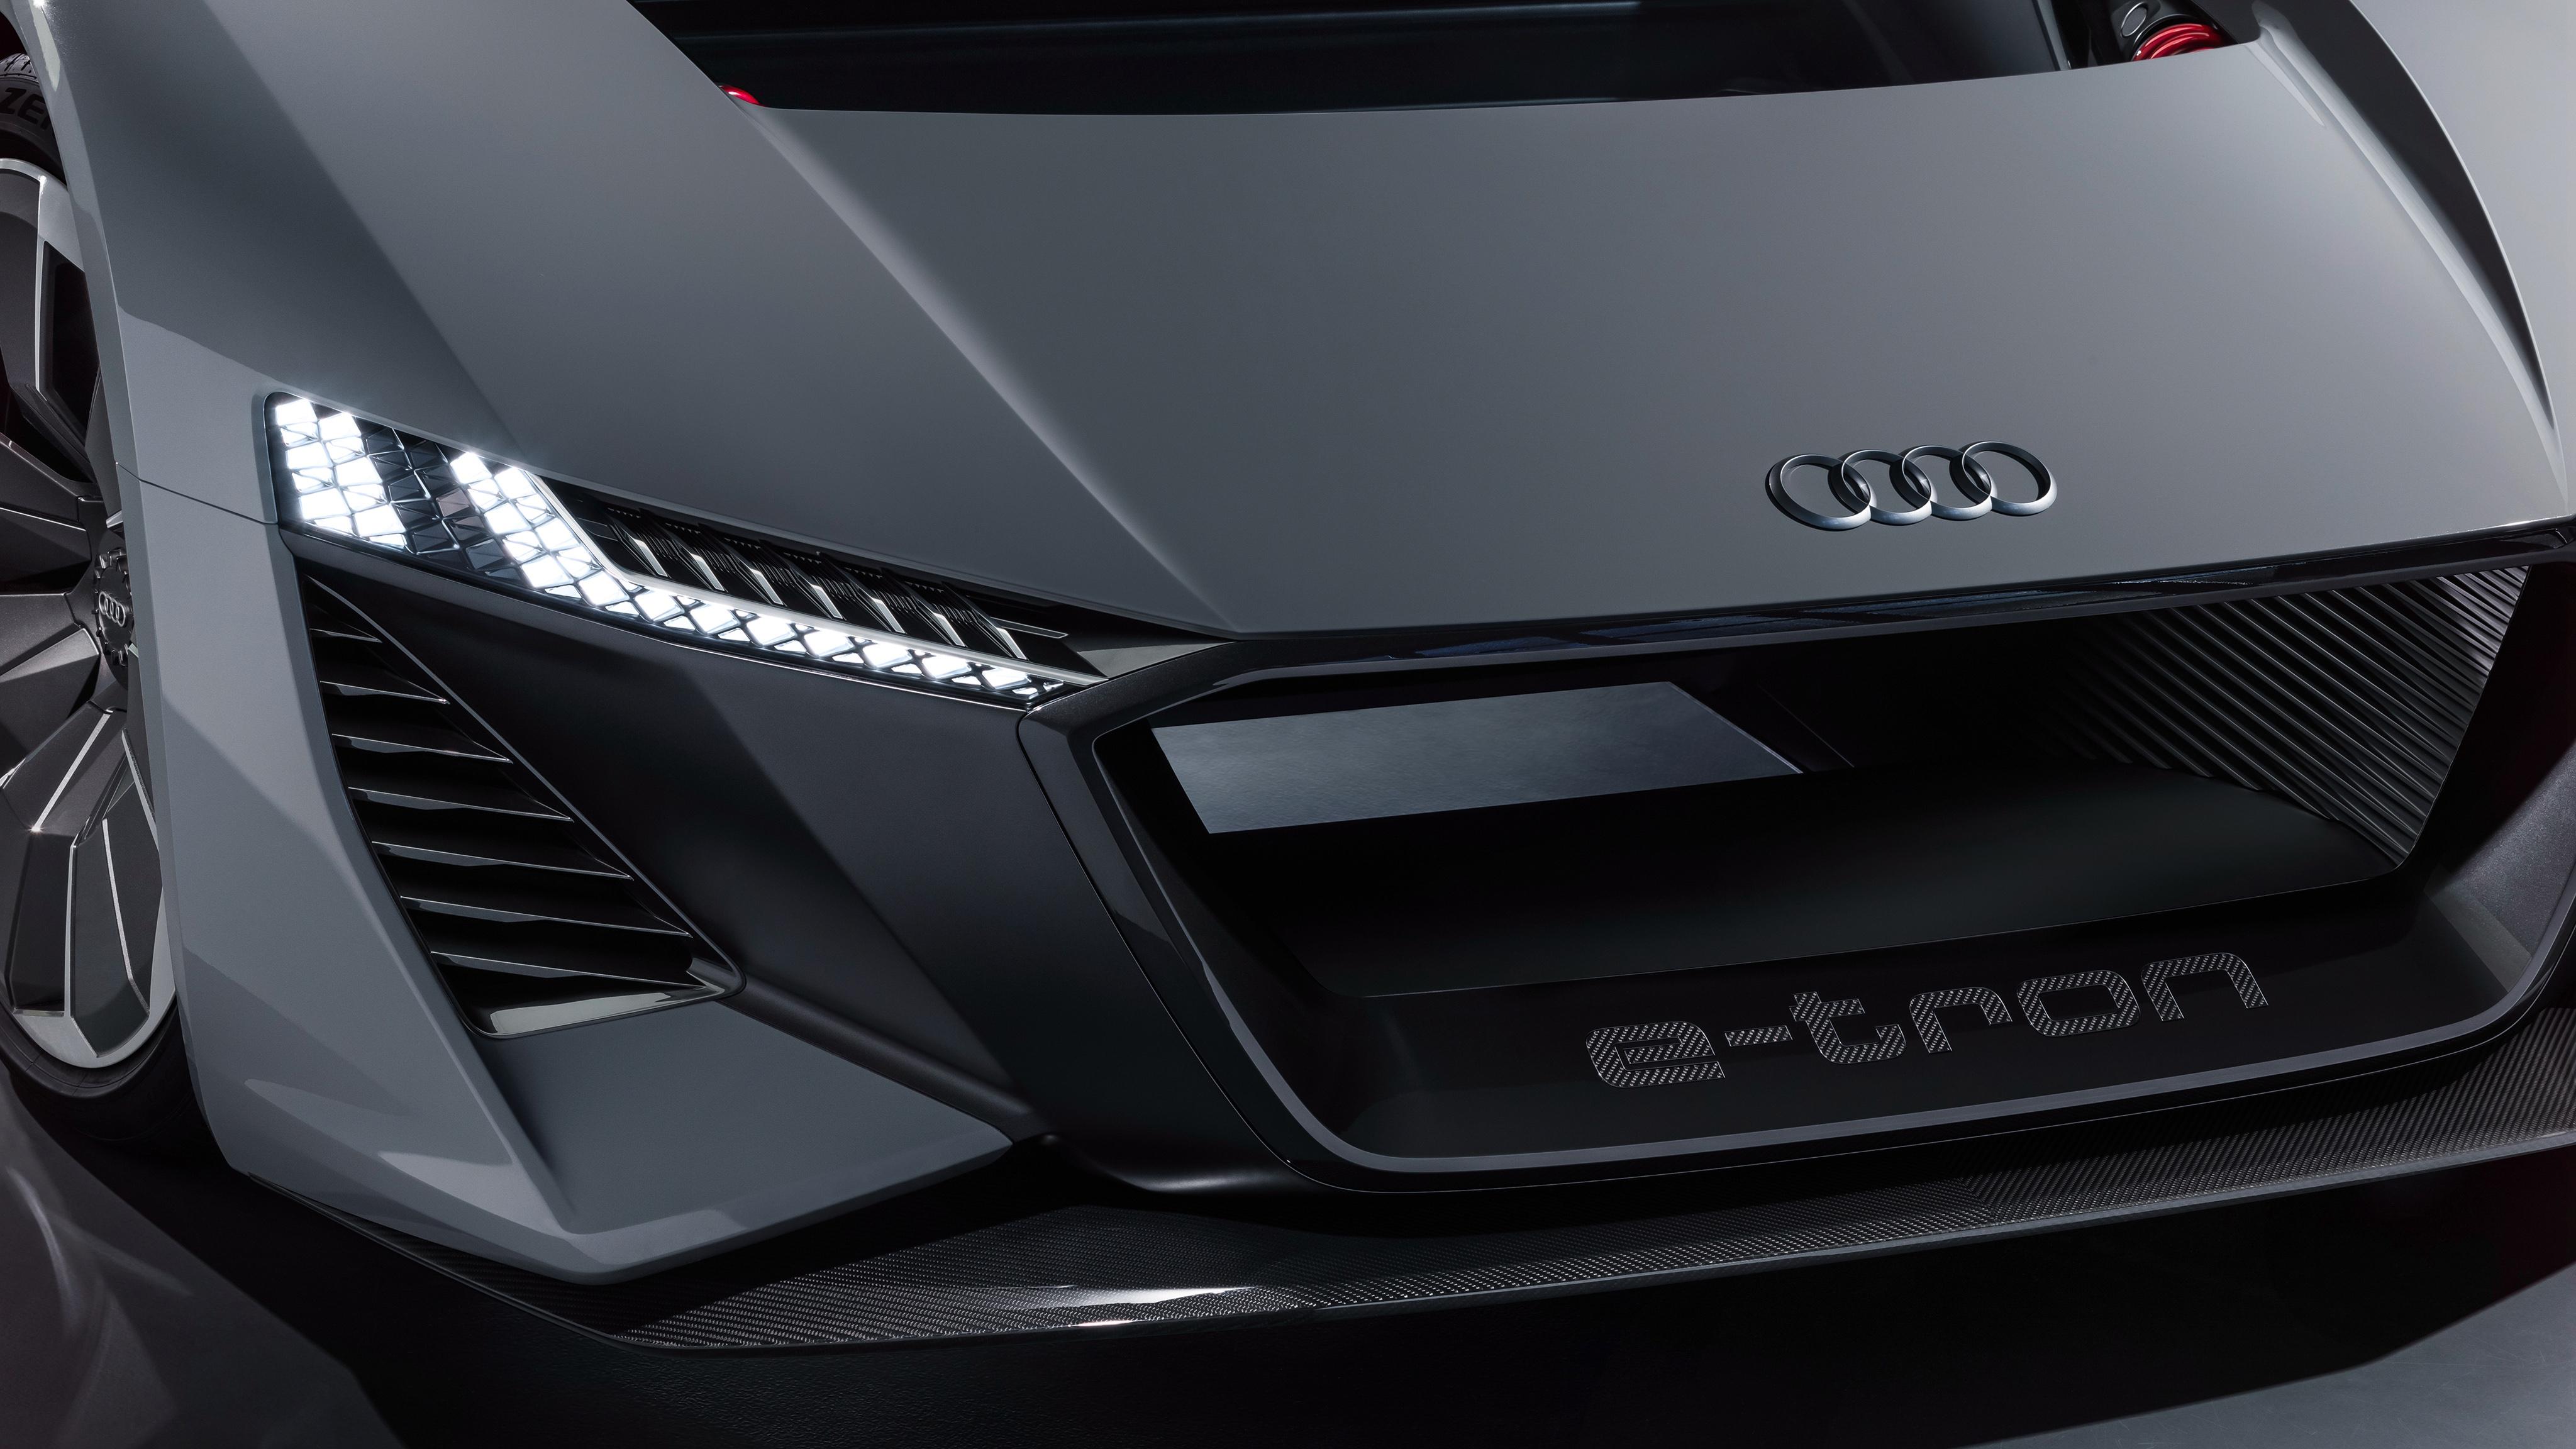 Audi PB 18 e-tron 2018 4K 2 Wallpaper | HD Car Wallpapers | ID #10989